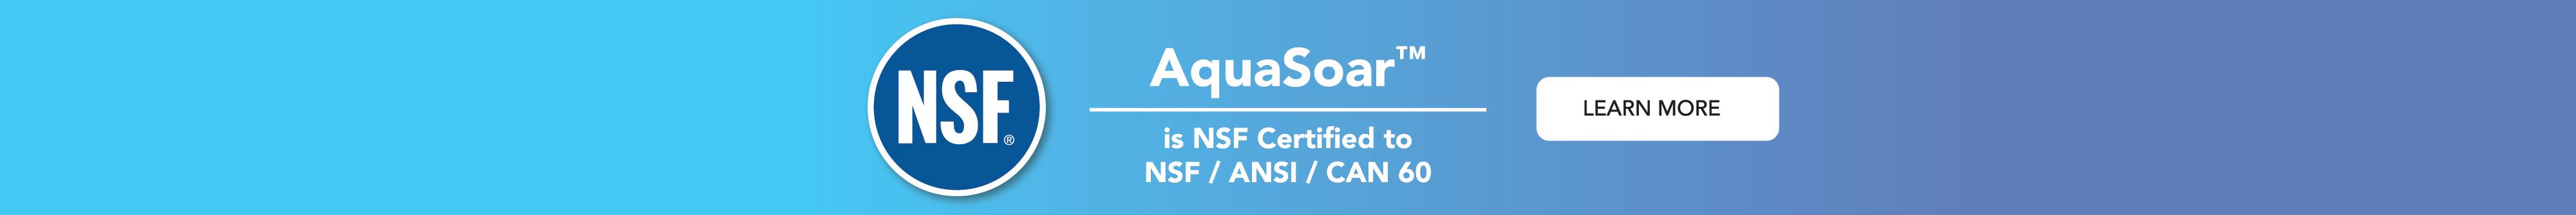 NSF-WebsiteBanner